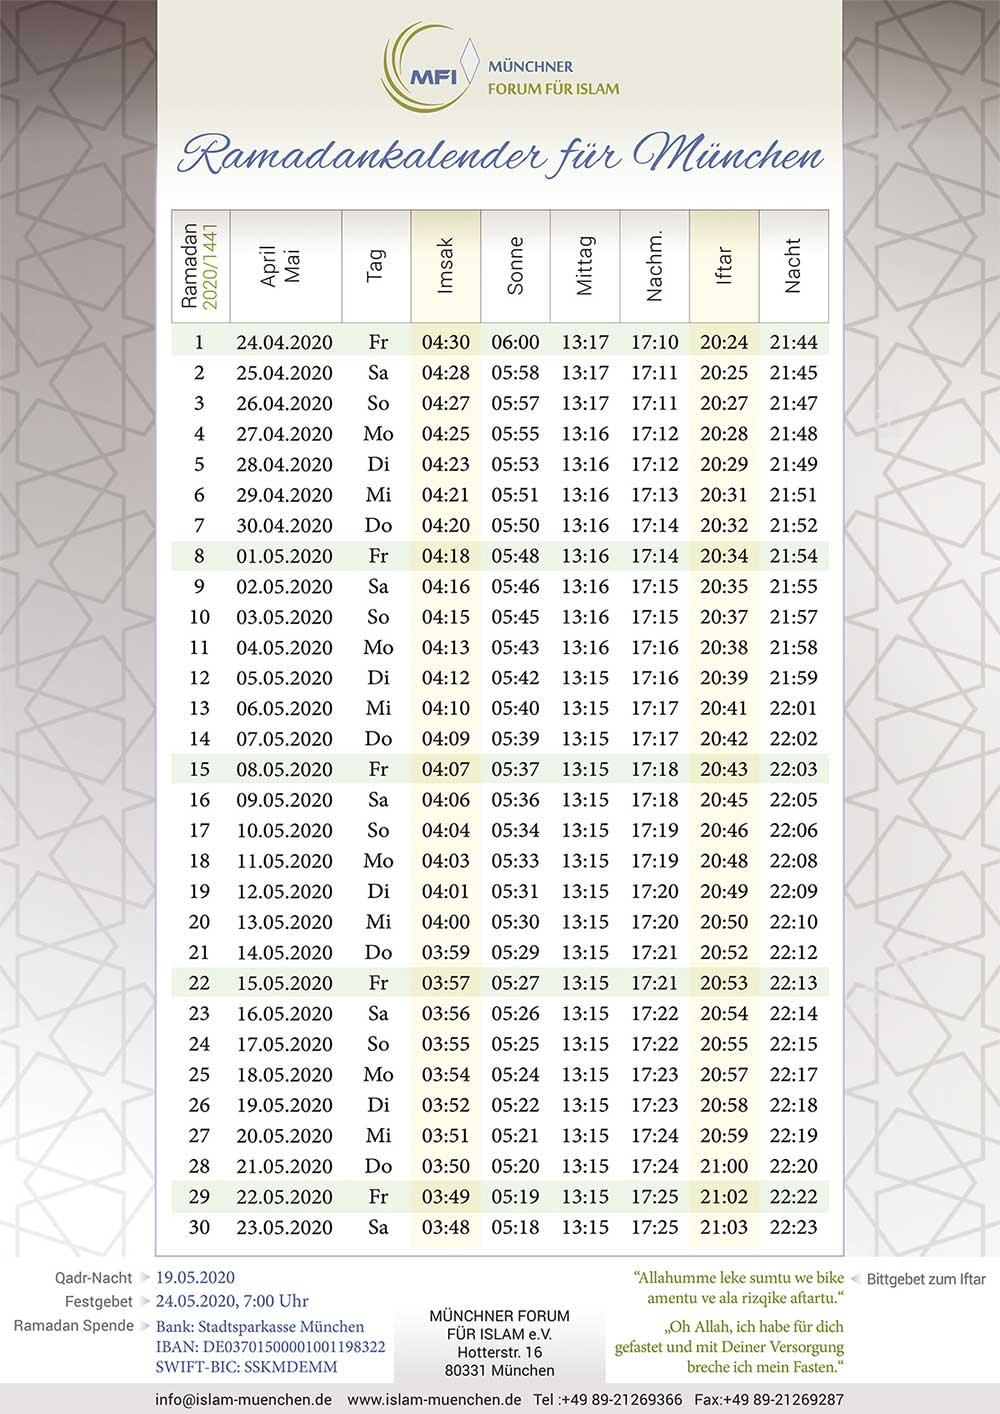 MFI Ramadankalender 2020